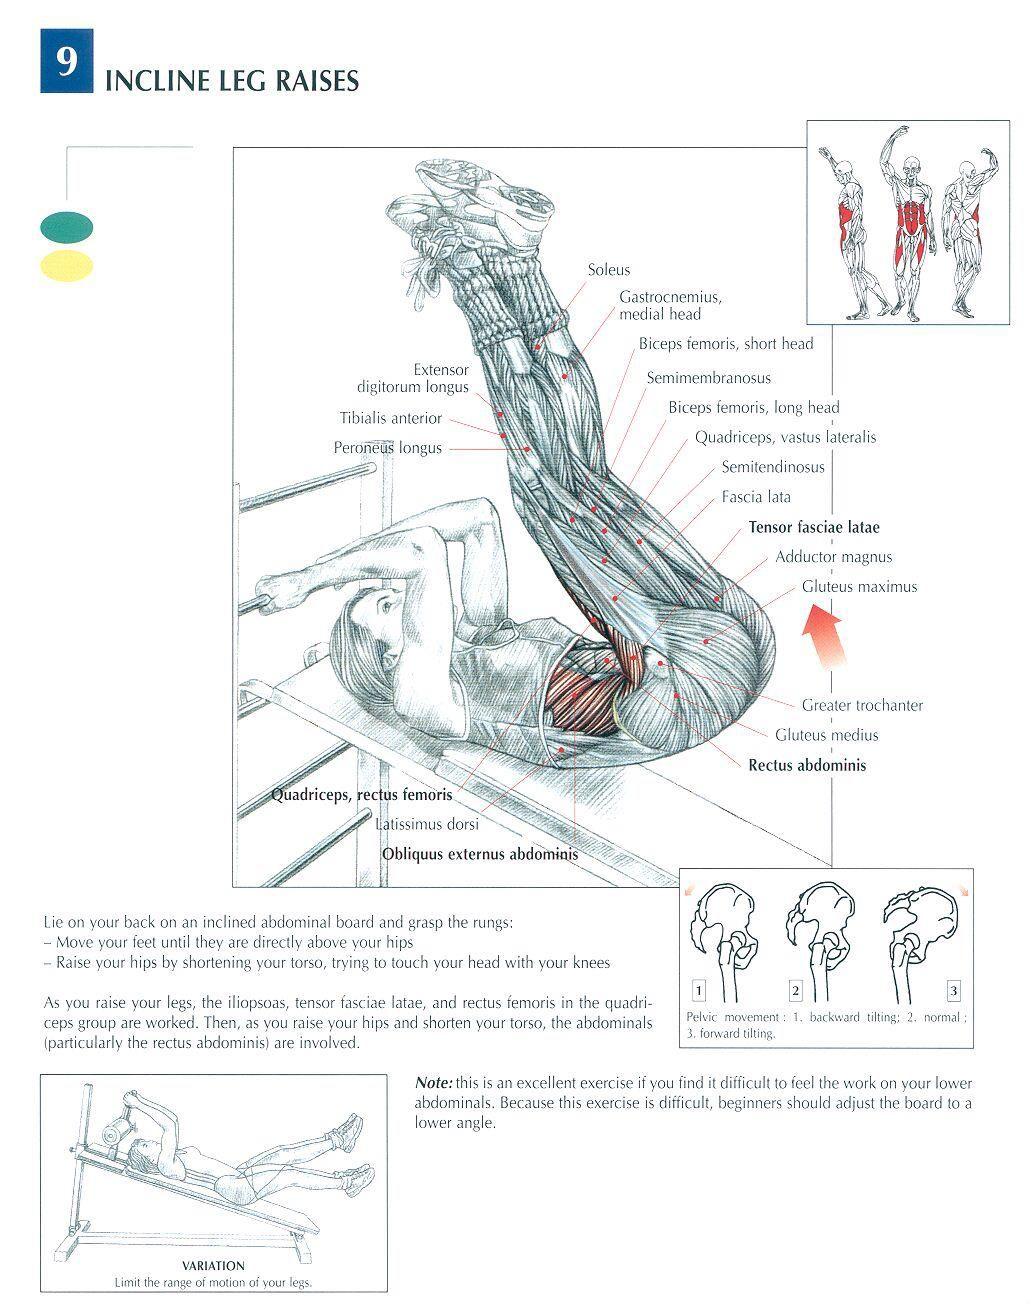 pull up muscles worked diagram 1999 ford f350 radio wiring the anatomy of stiff leg deadlift raises raising